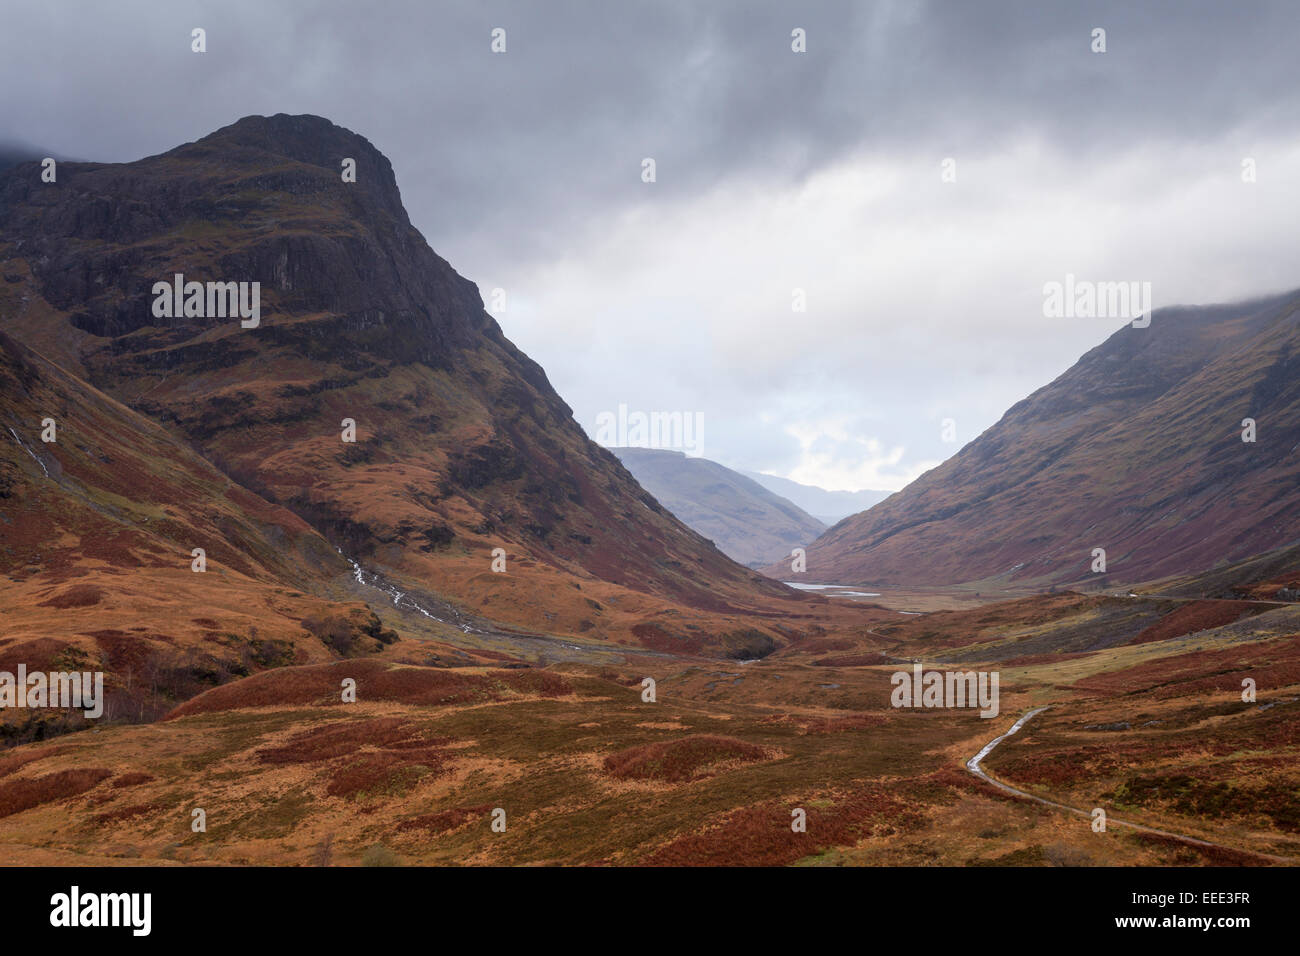 The Pass of Glencoe in the Scottish Highlands, UK. - Stock Image